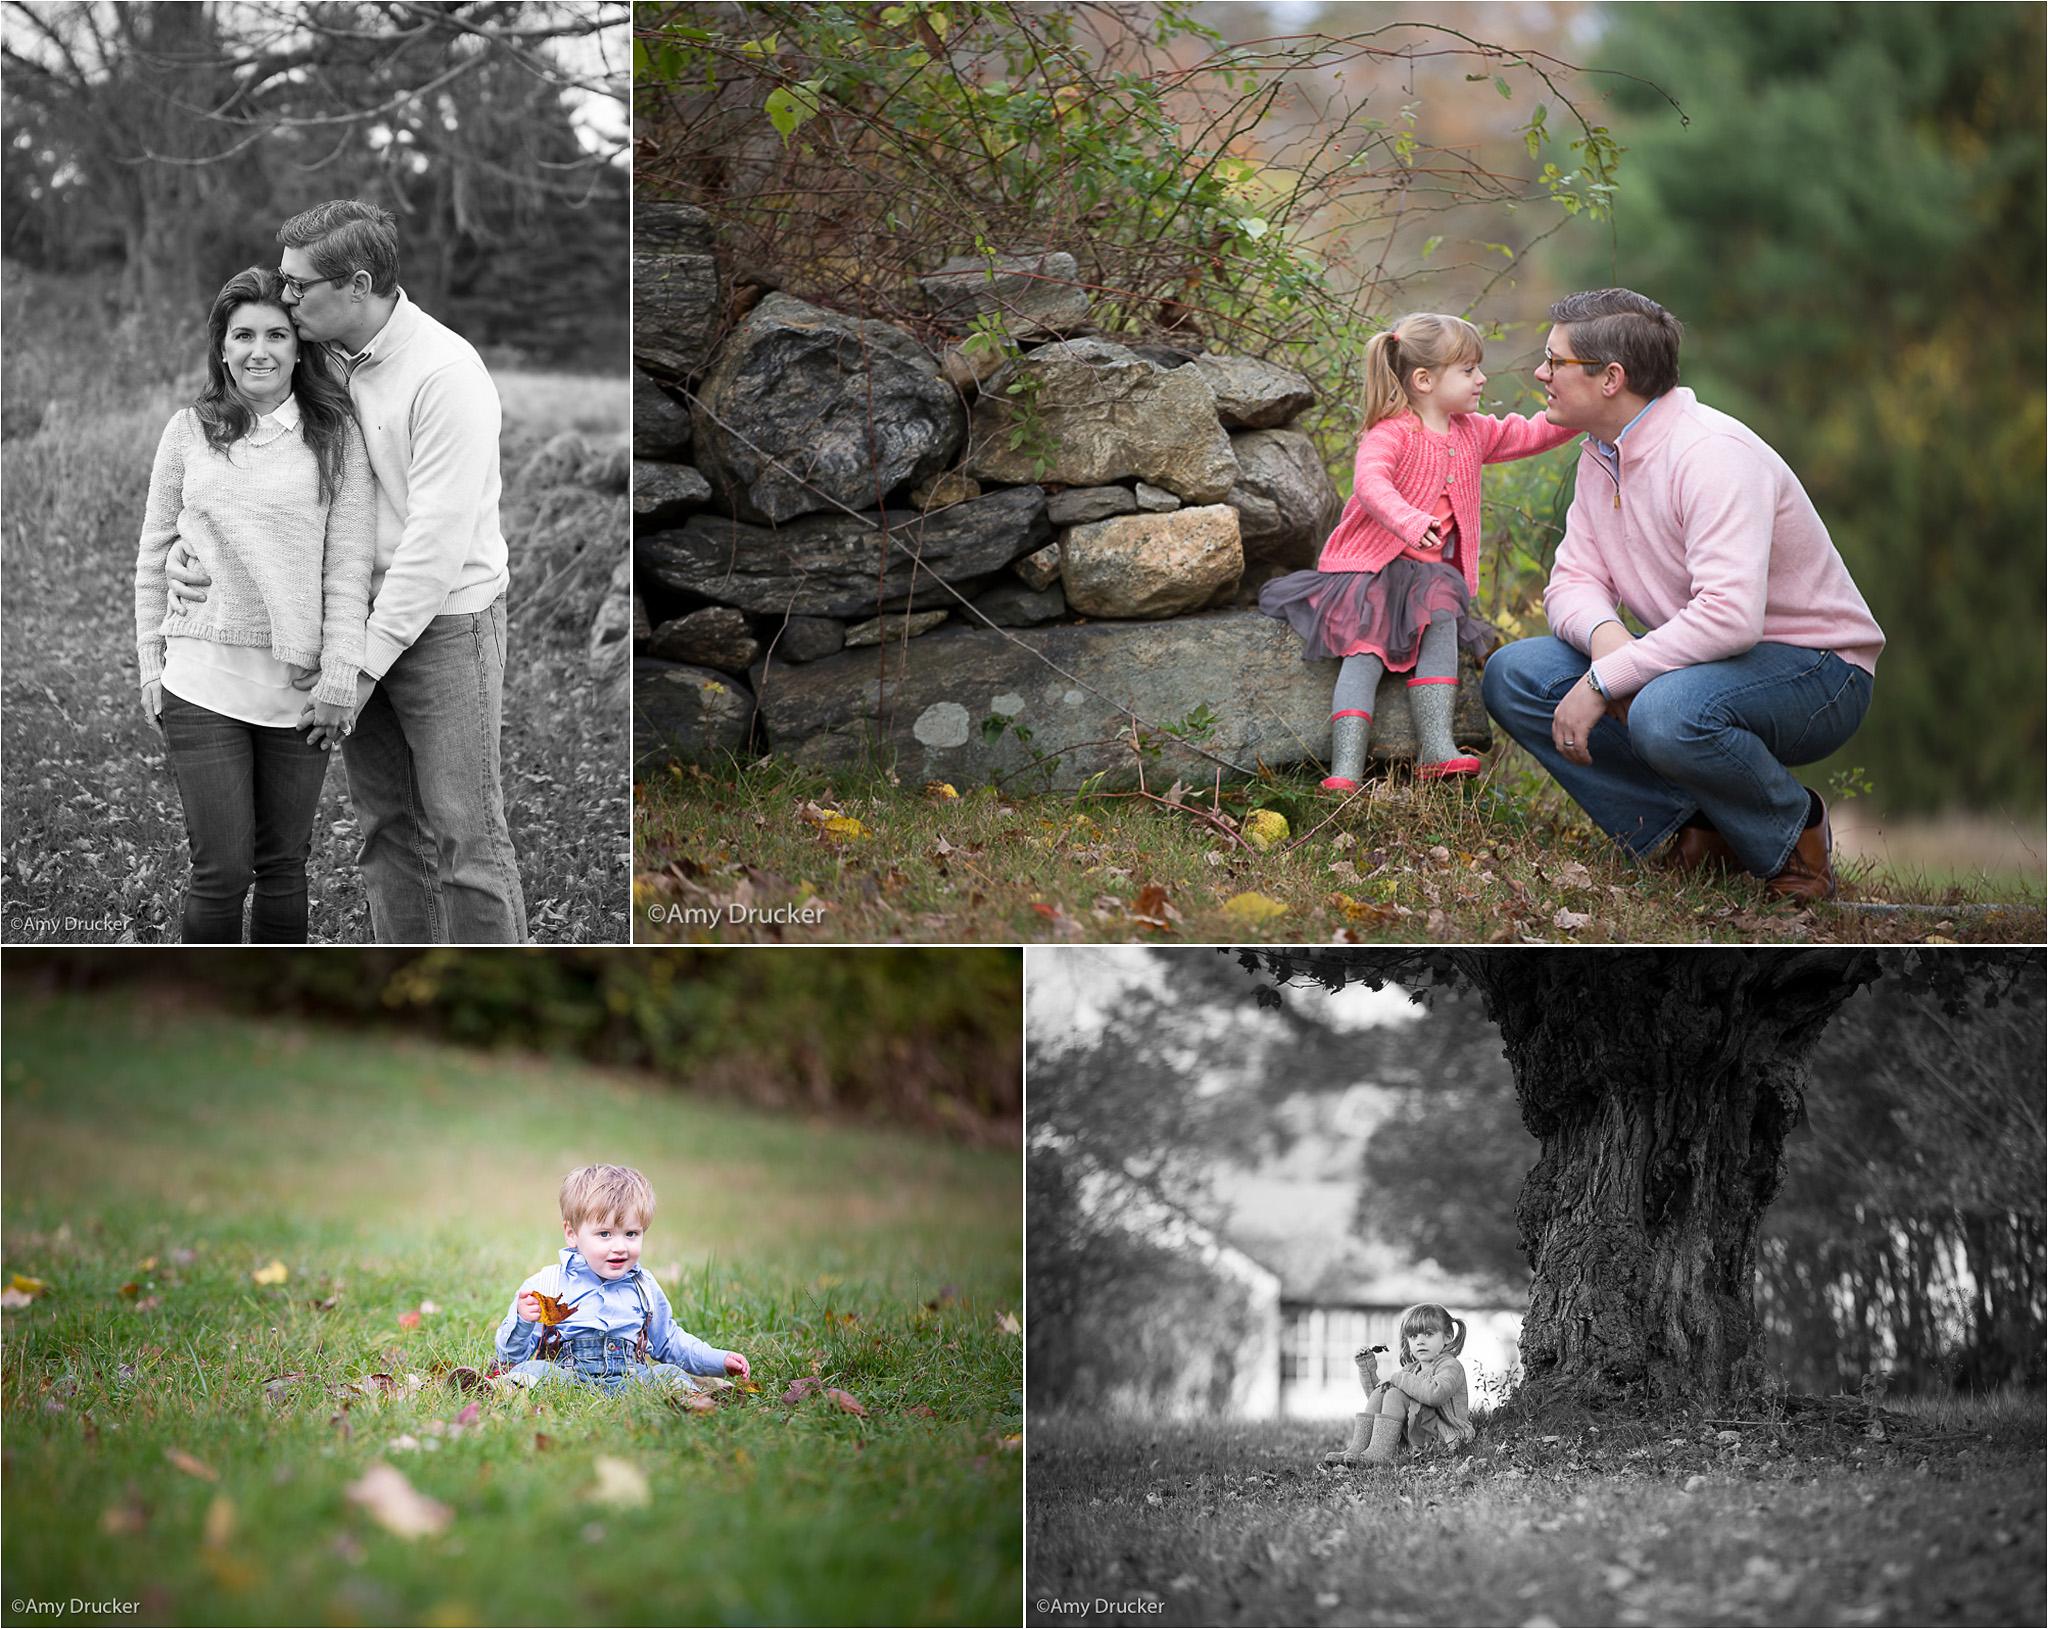 amy_drucker_new_york_lifestyle_family_photography